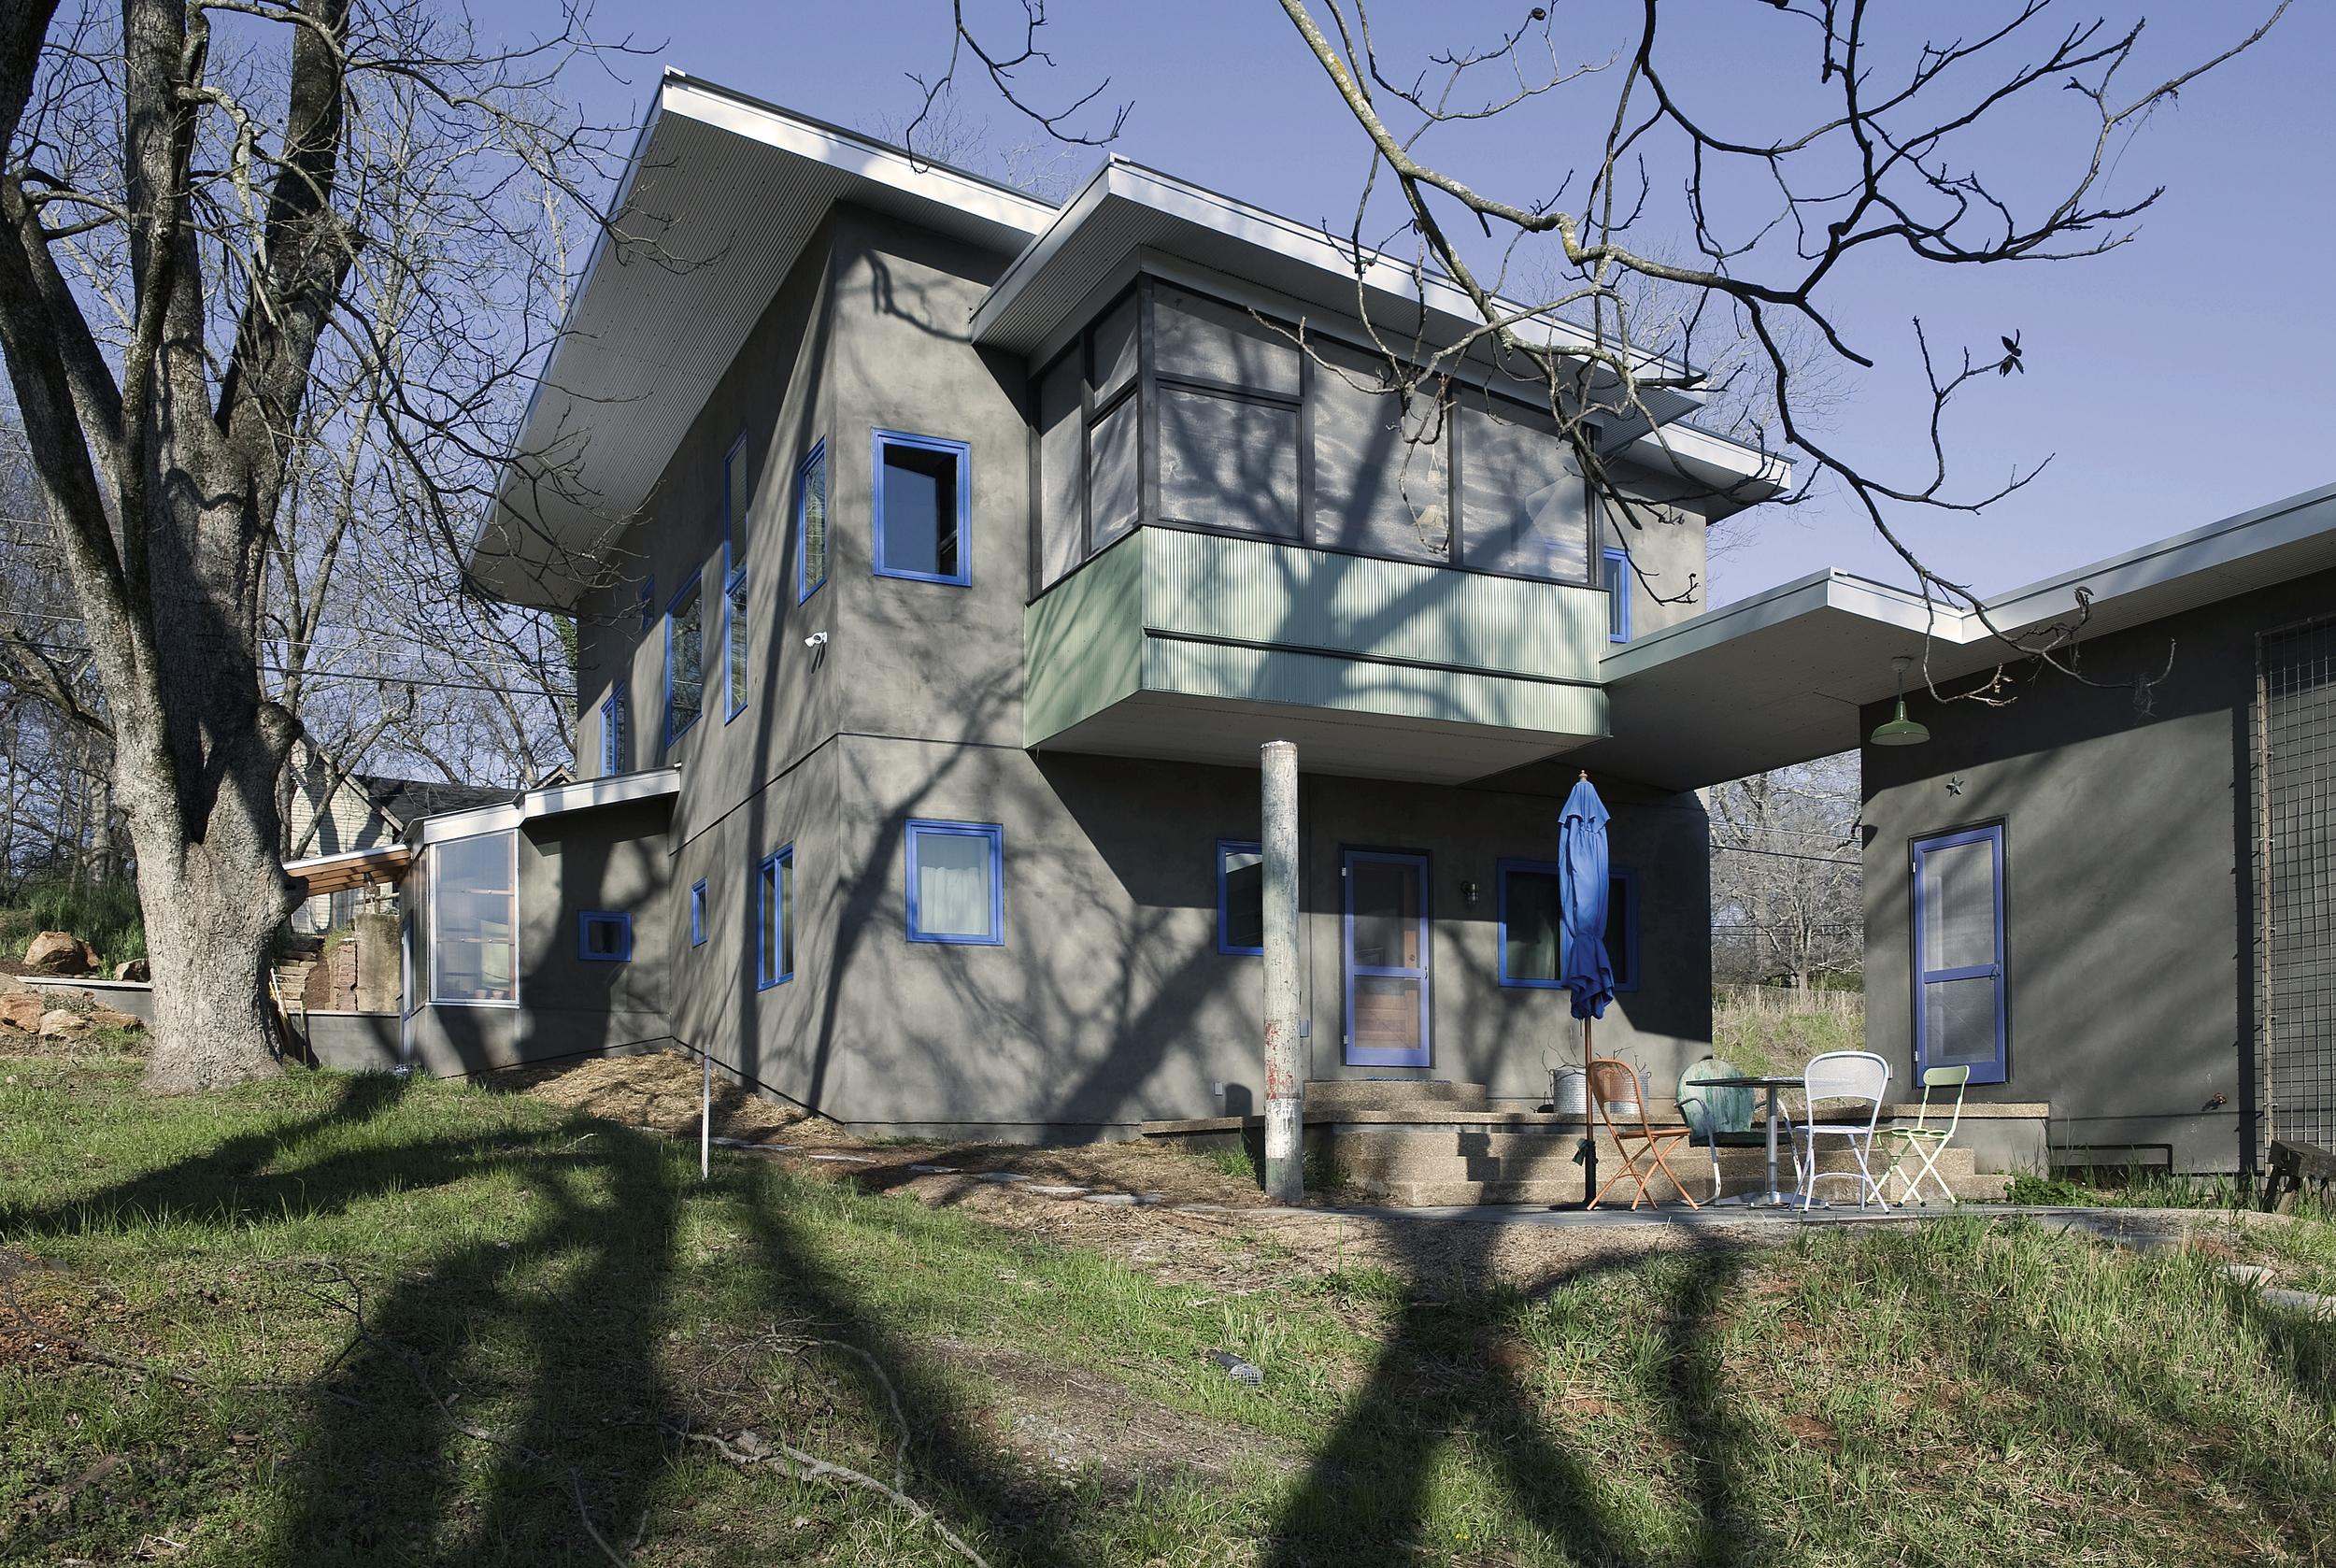 blue-trim-back-porch-view.jpg